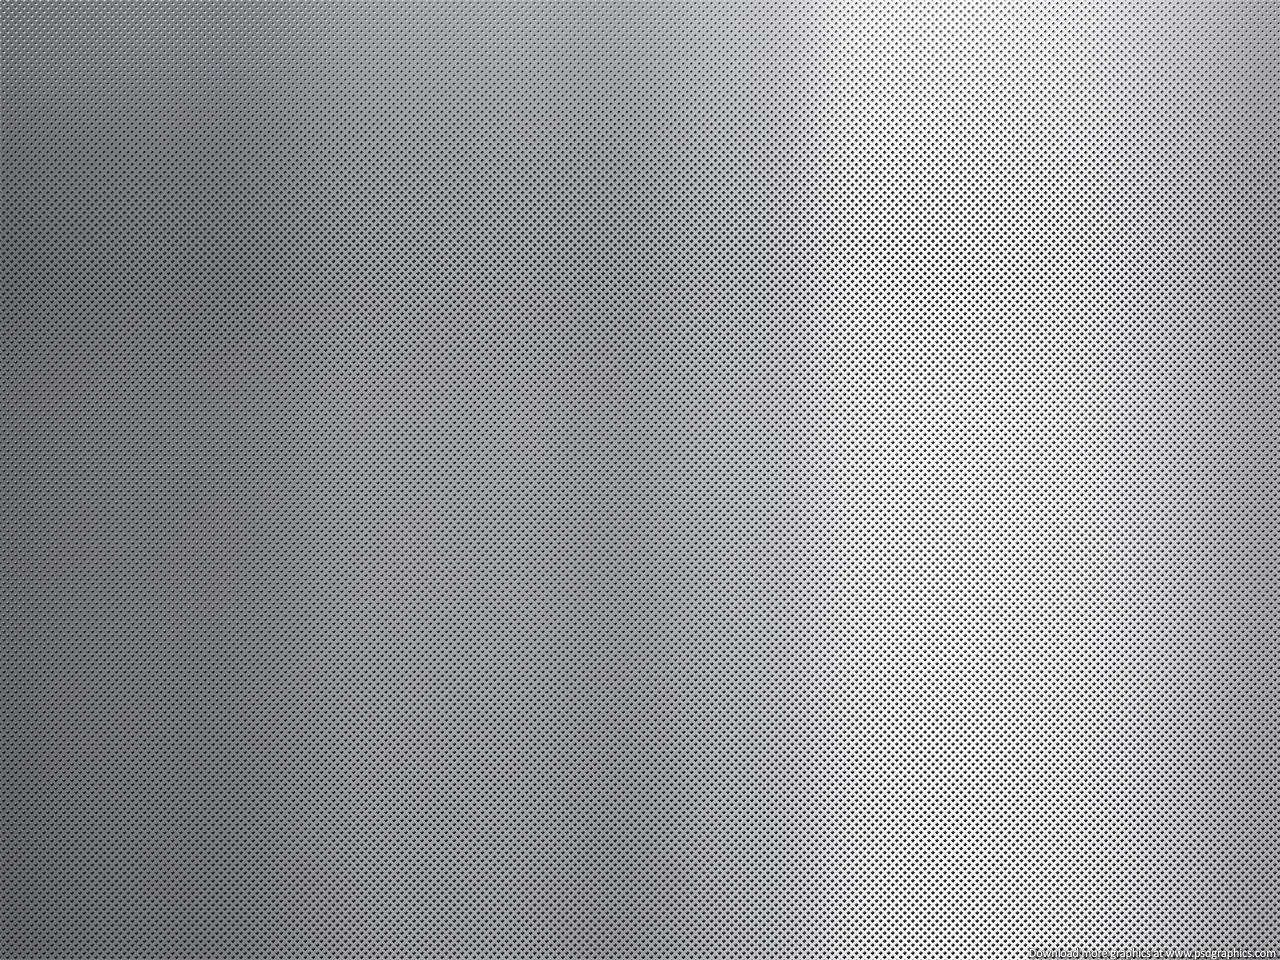 Aluminum Sheet Texture Psdgraphics